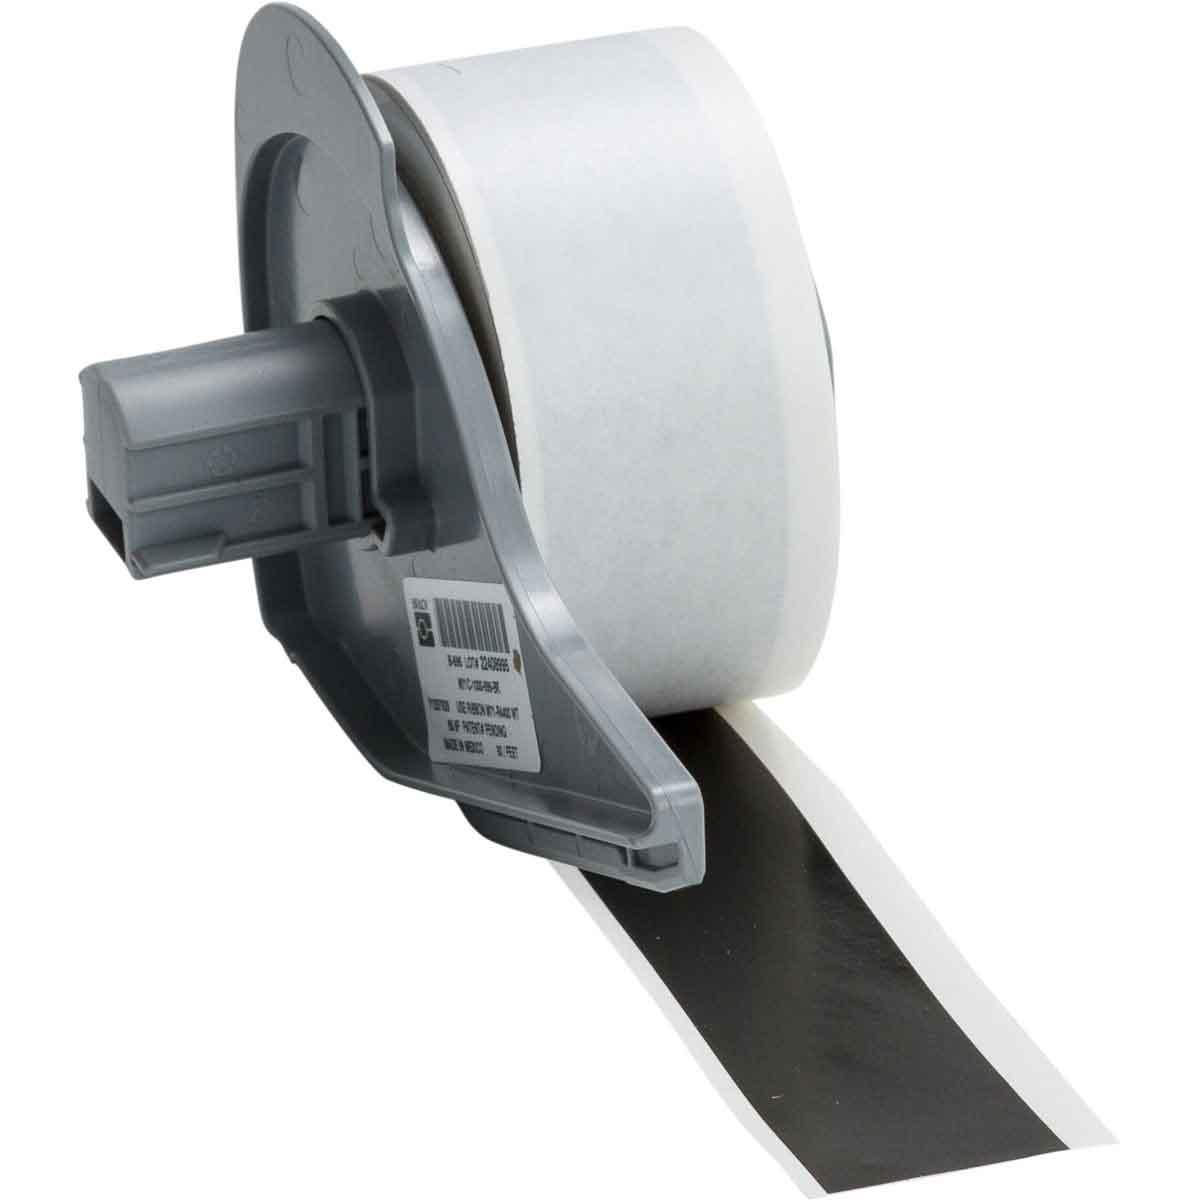 Brady® M71C-1000-595-BK Blank Thermal Transfer Tape, 50 ft L x 1 in W, Black, B-595 Vinyl, Permanent Acrylic Adhesive, -40 to 180 deg F